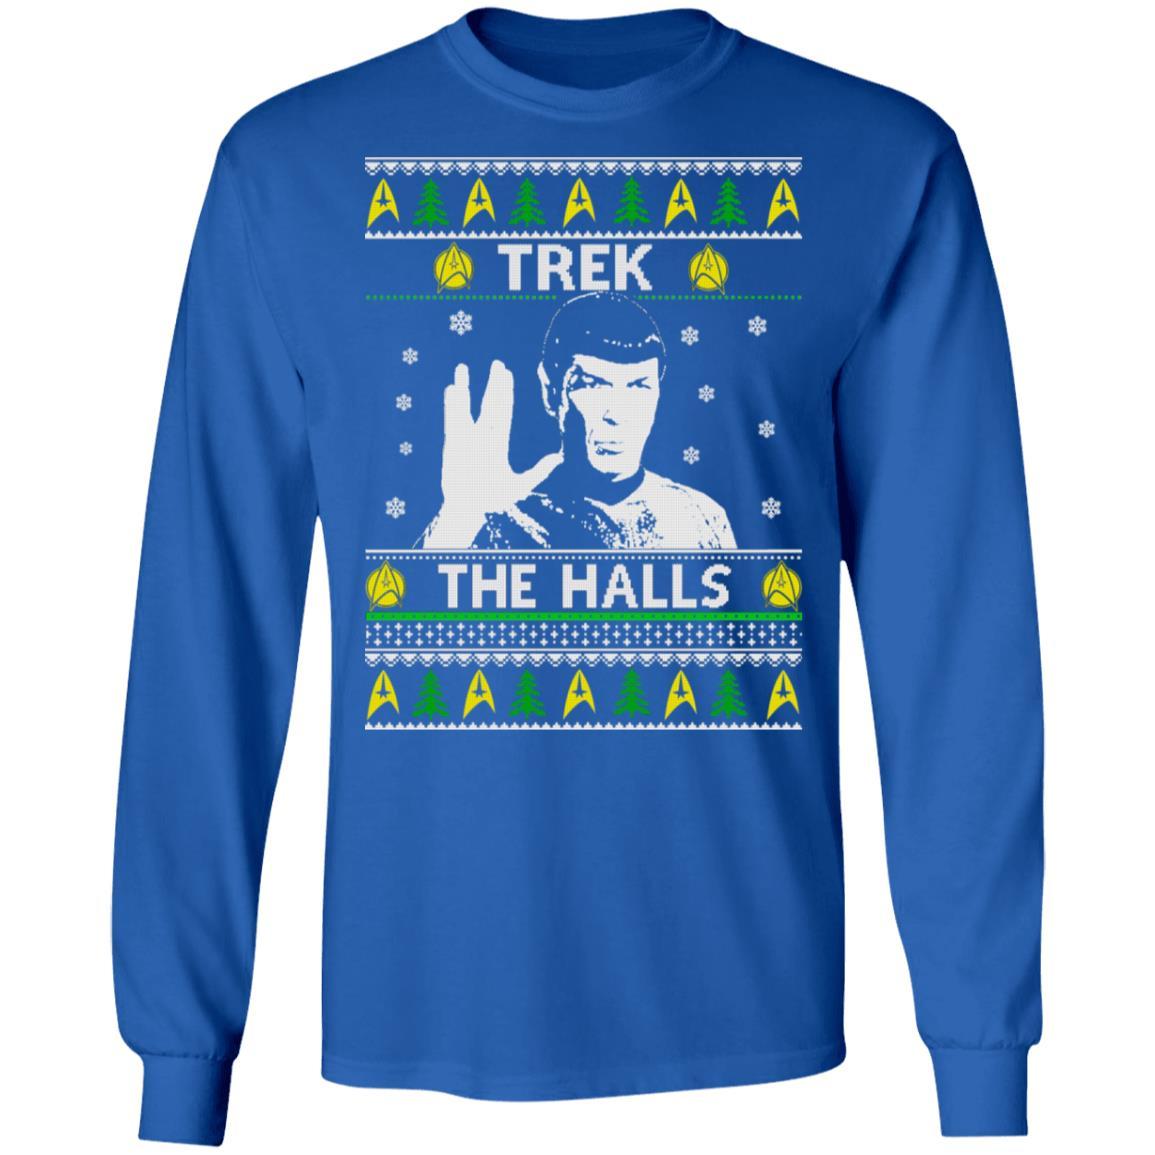 Star Trek Trek The Halls Christmas sweater, long sleeve, t shirt, hoodie